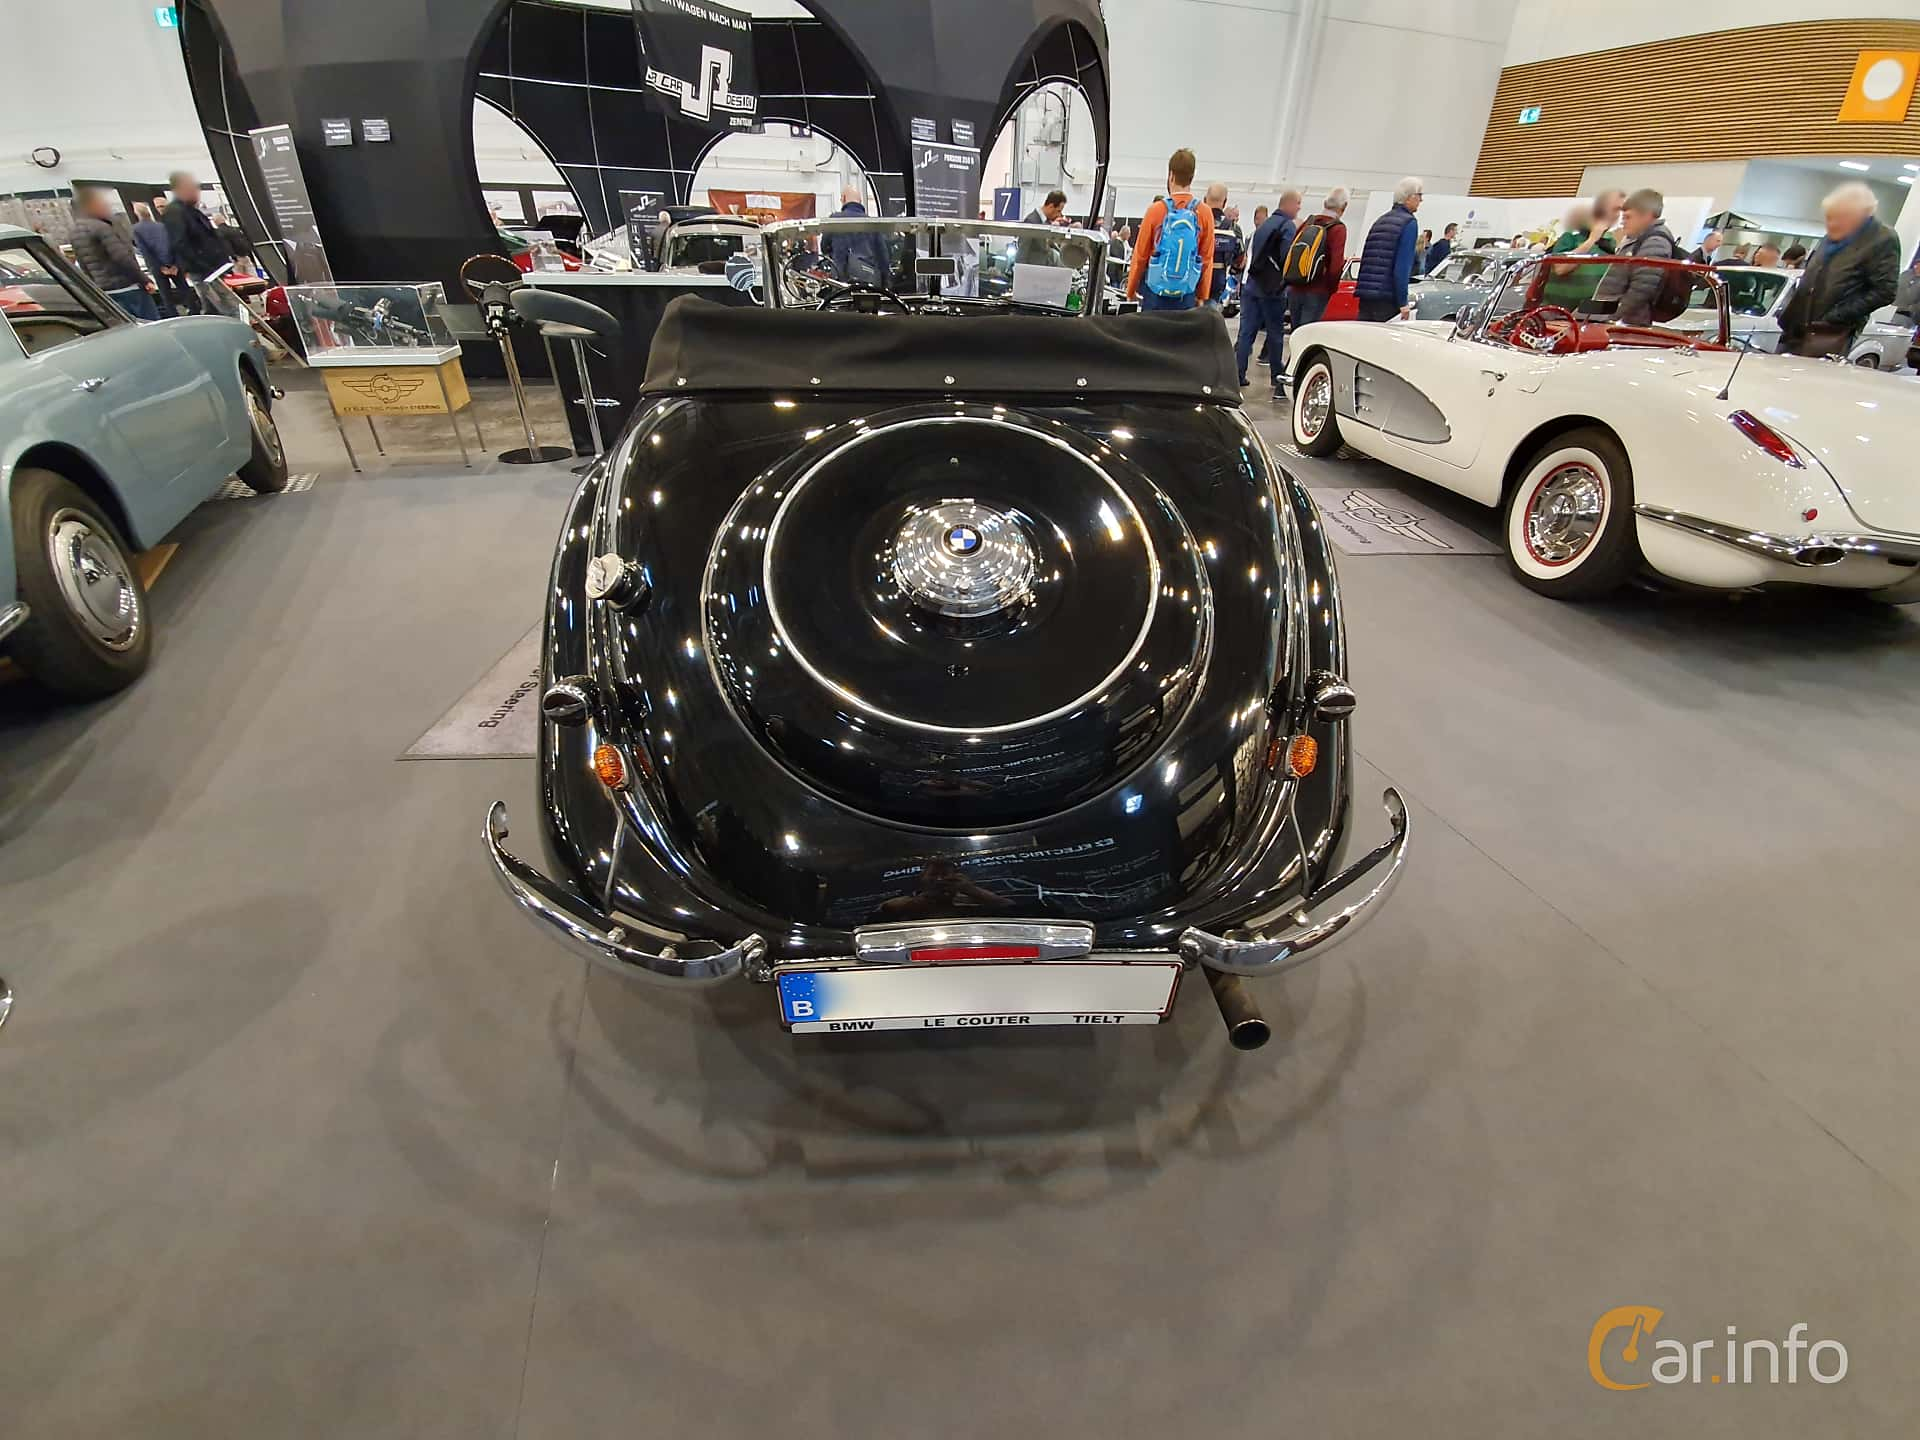 BMW 328 2.0 Manual, 80hp, 1937 at Techno Classica Essen 2019